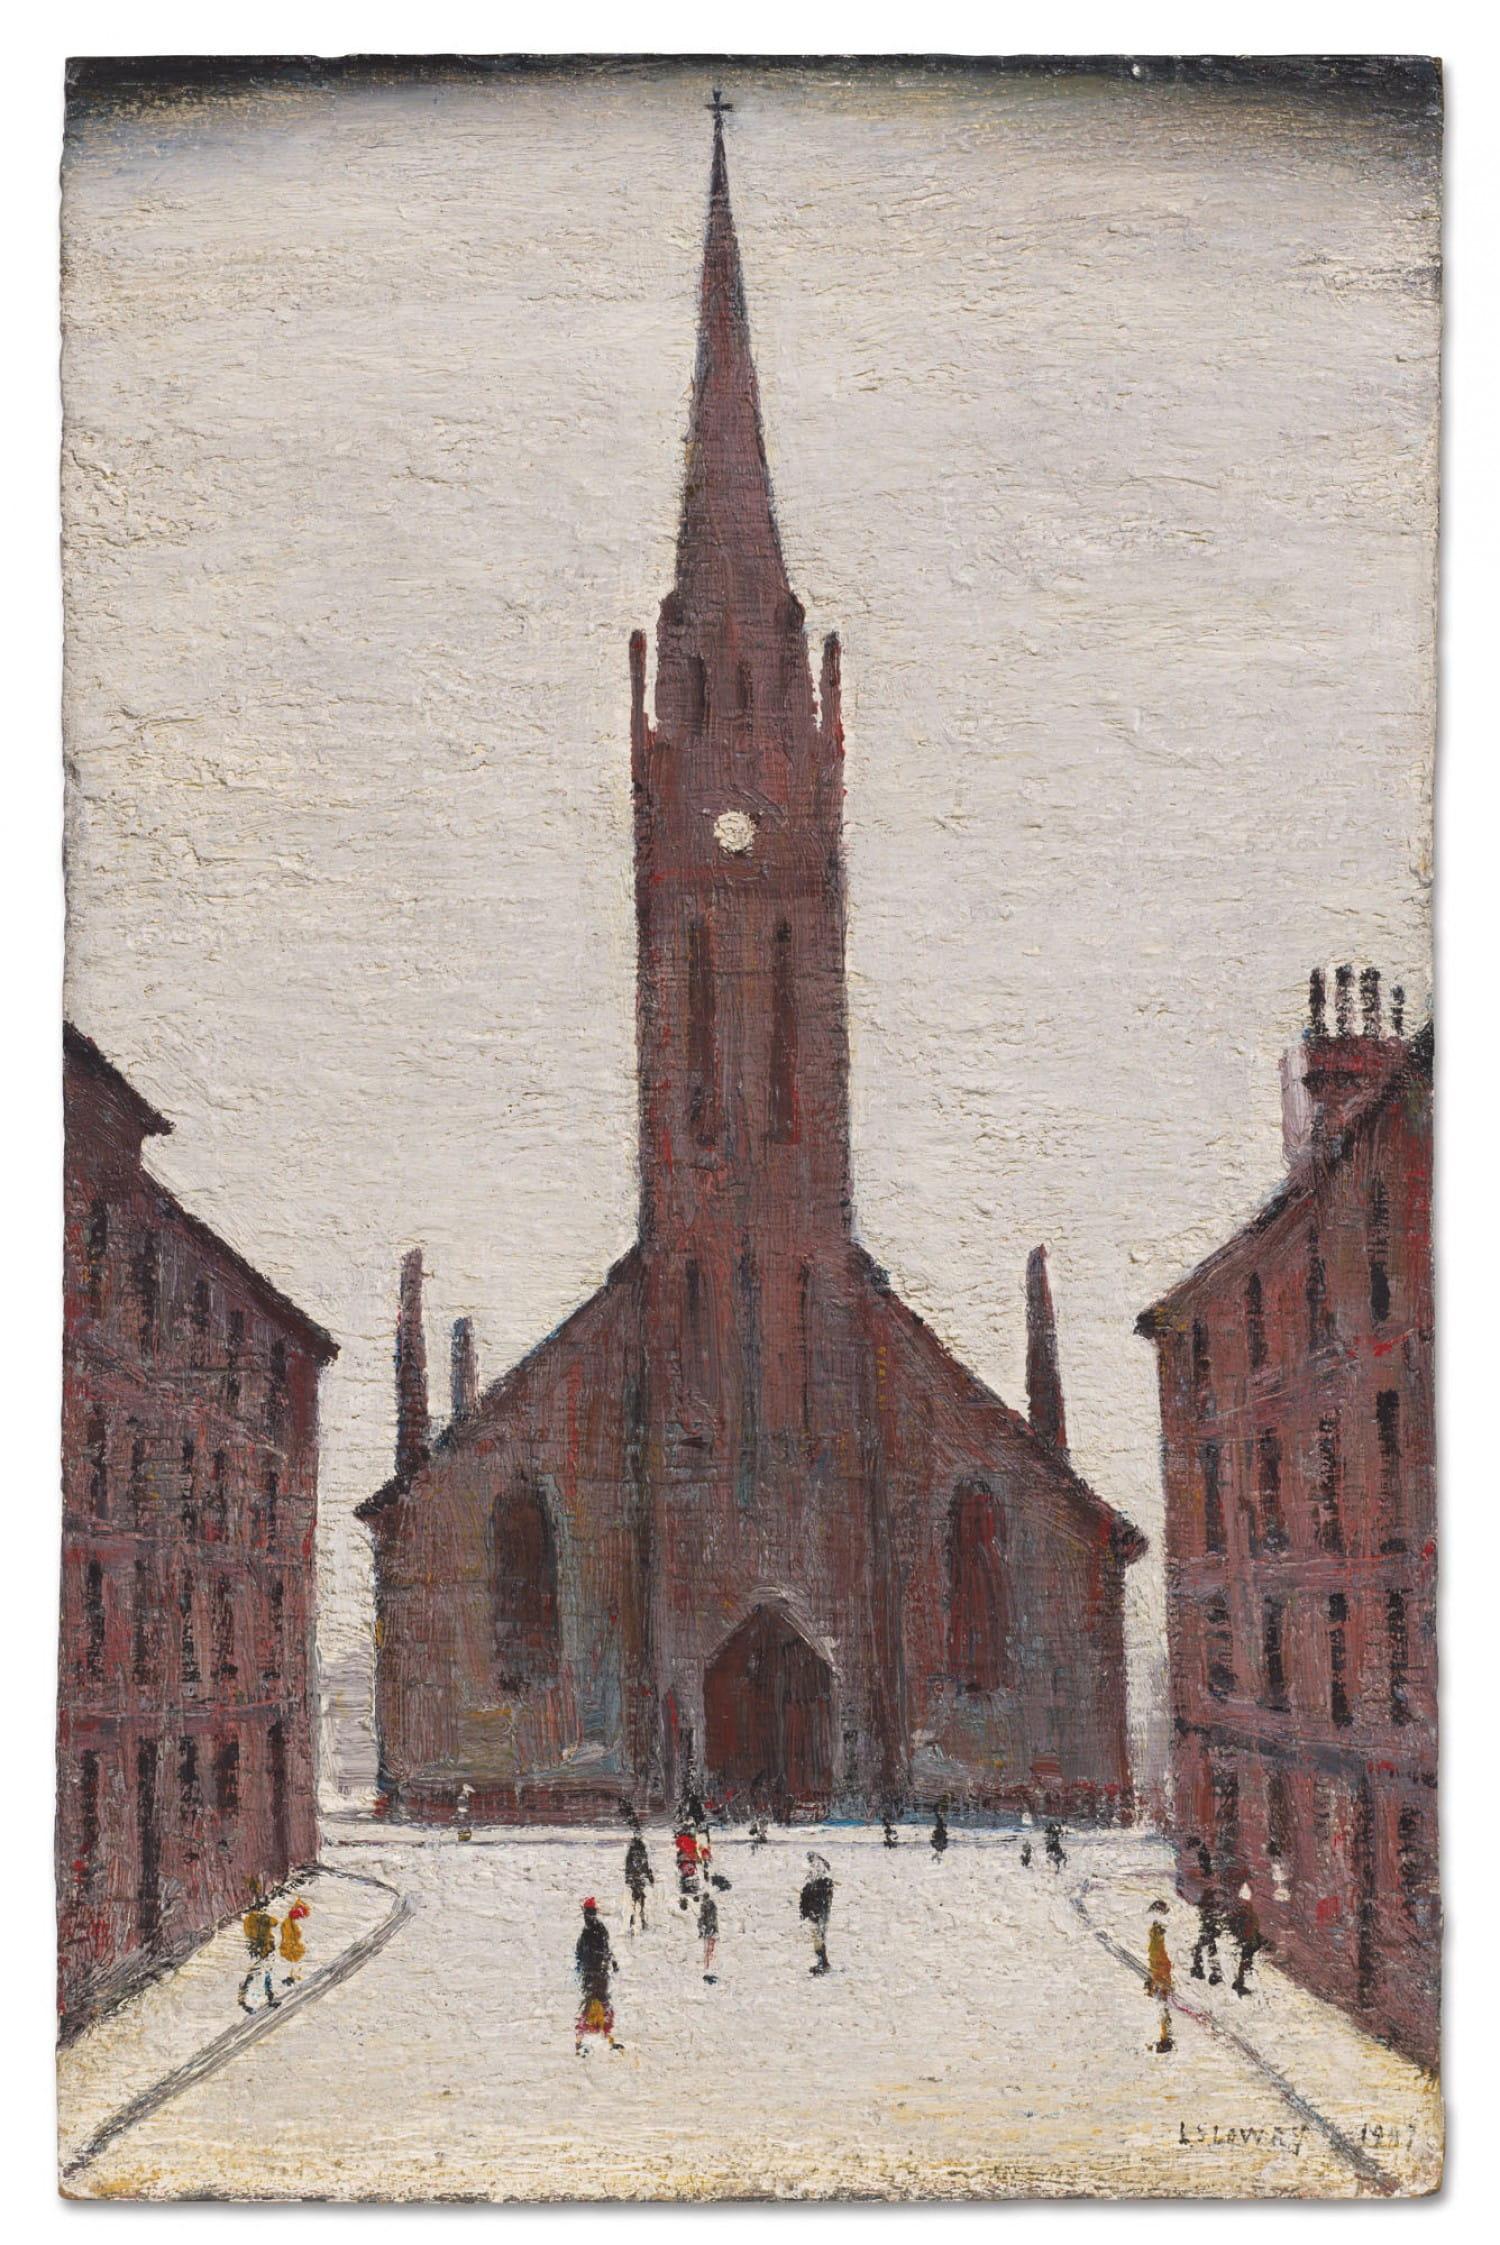 St Matthew's Church, Bath Street, 1947, by LS Lowry